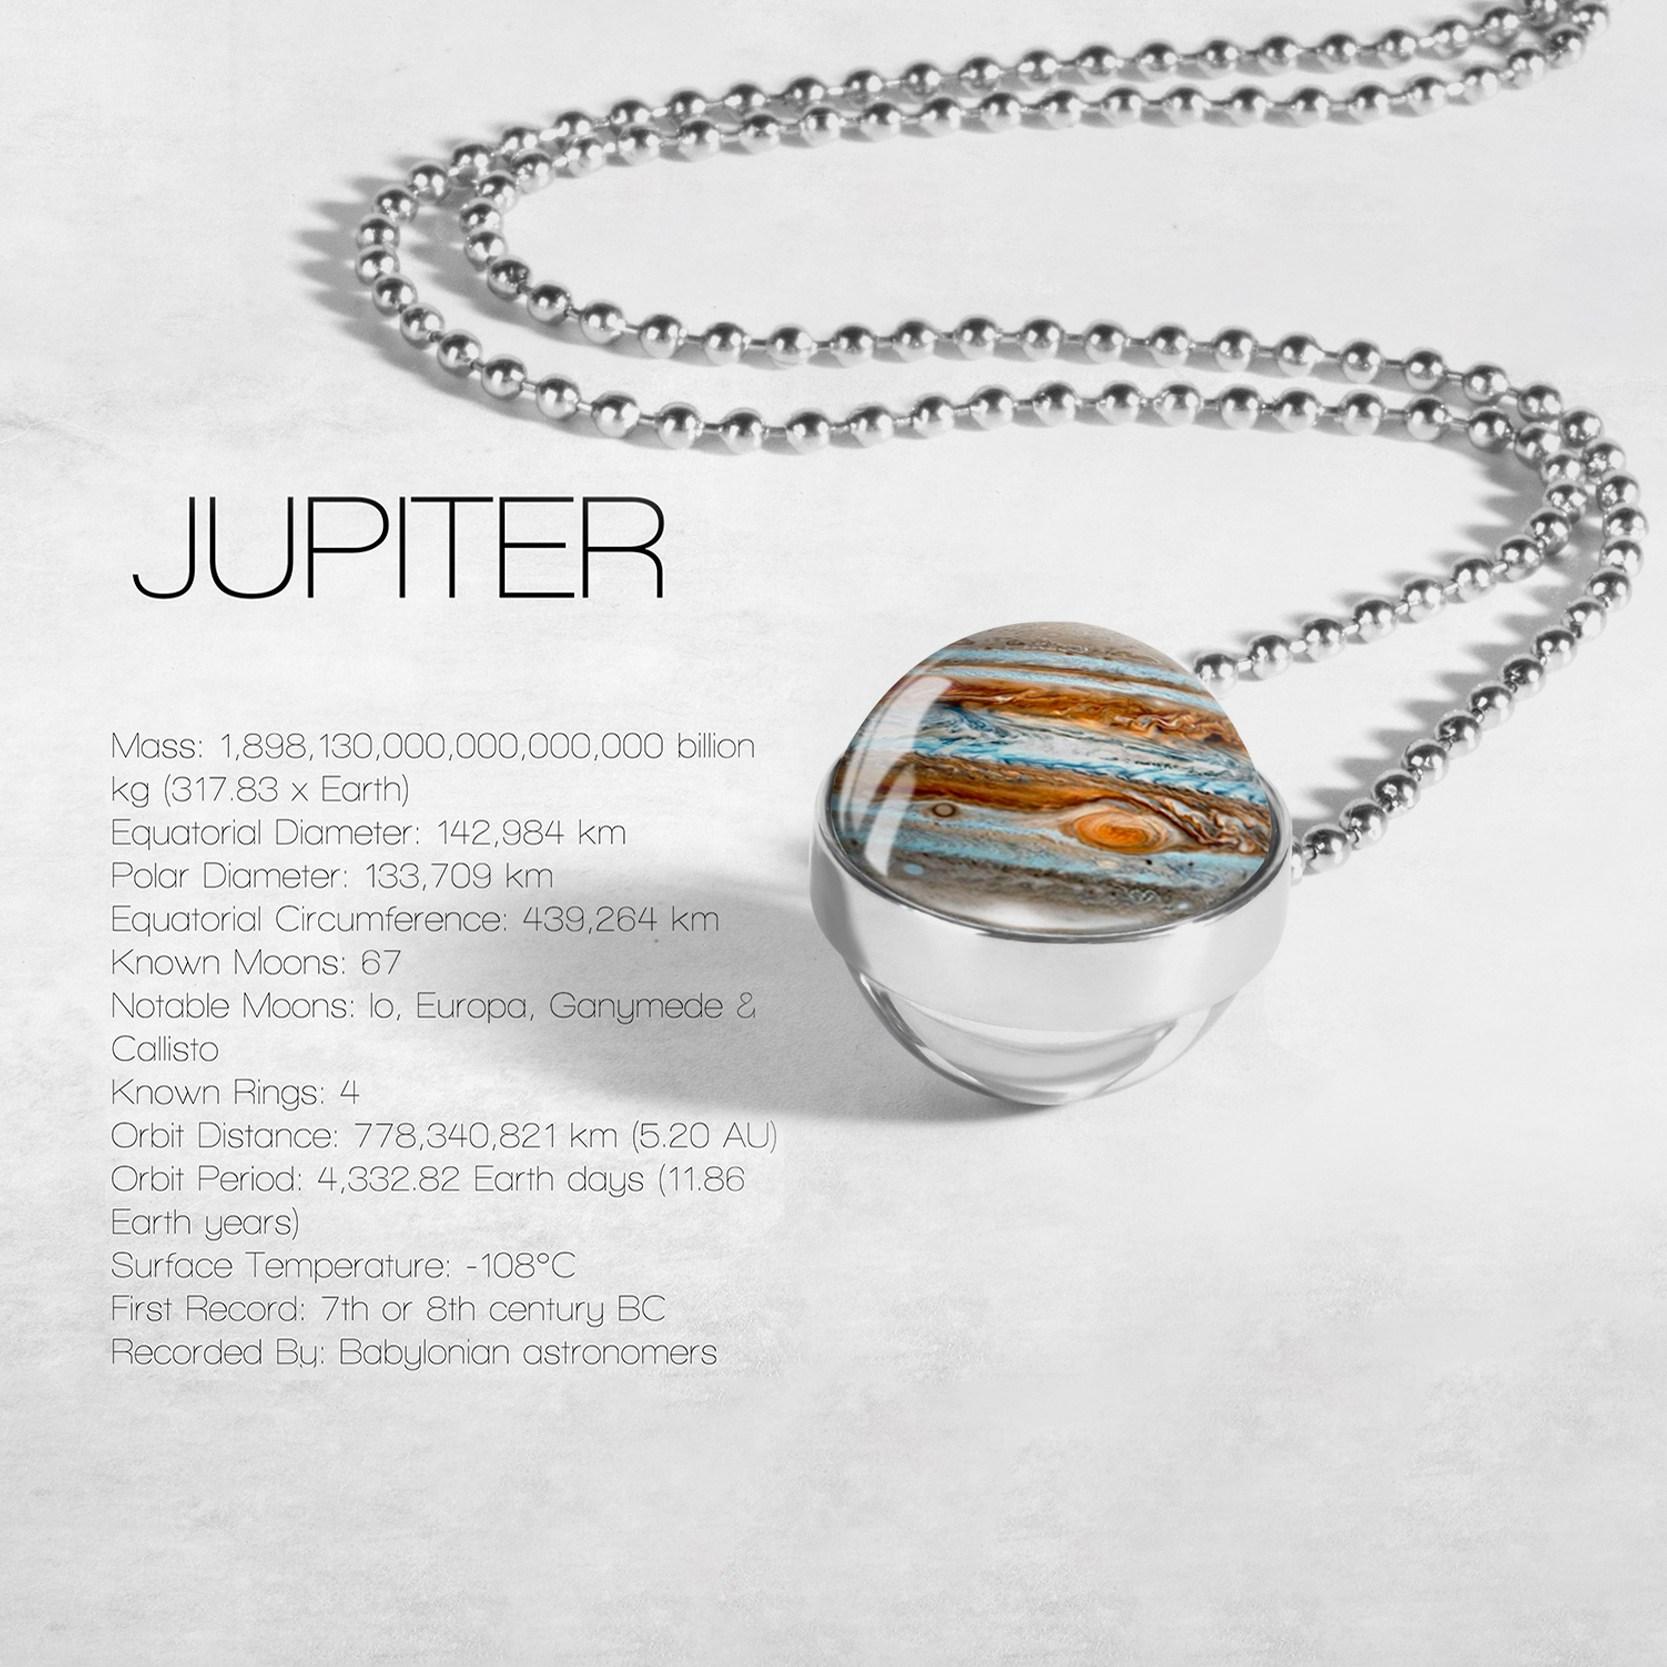 Globe Double Sided Necklace Solar System Planet Venus Mercury Mars Saturn Uranus Neptune Earth Sun Pendant Dome Glass Necklaces 7